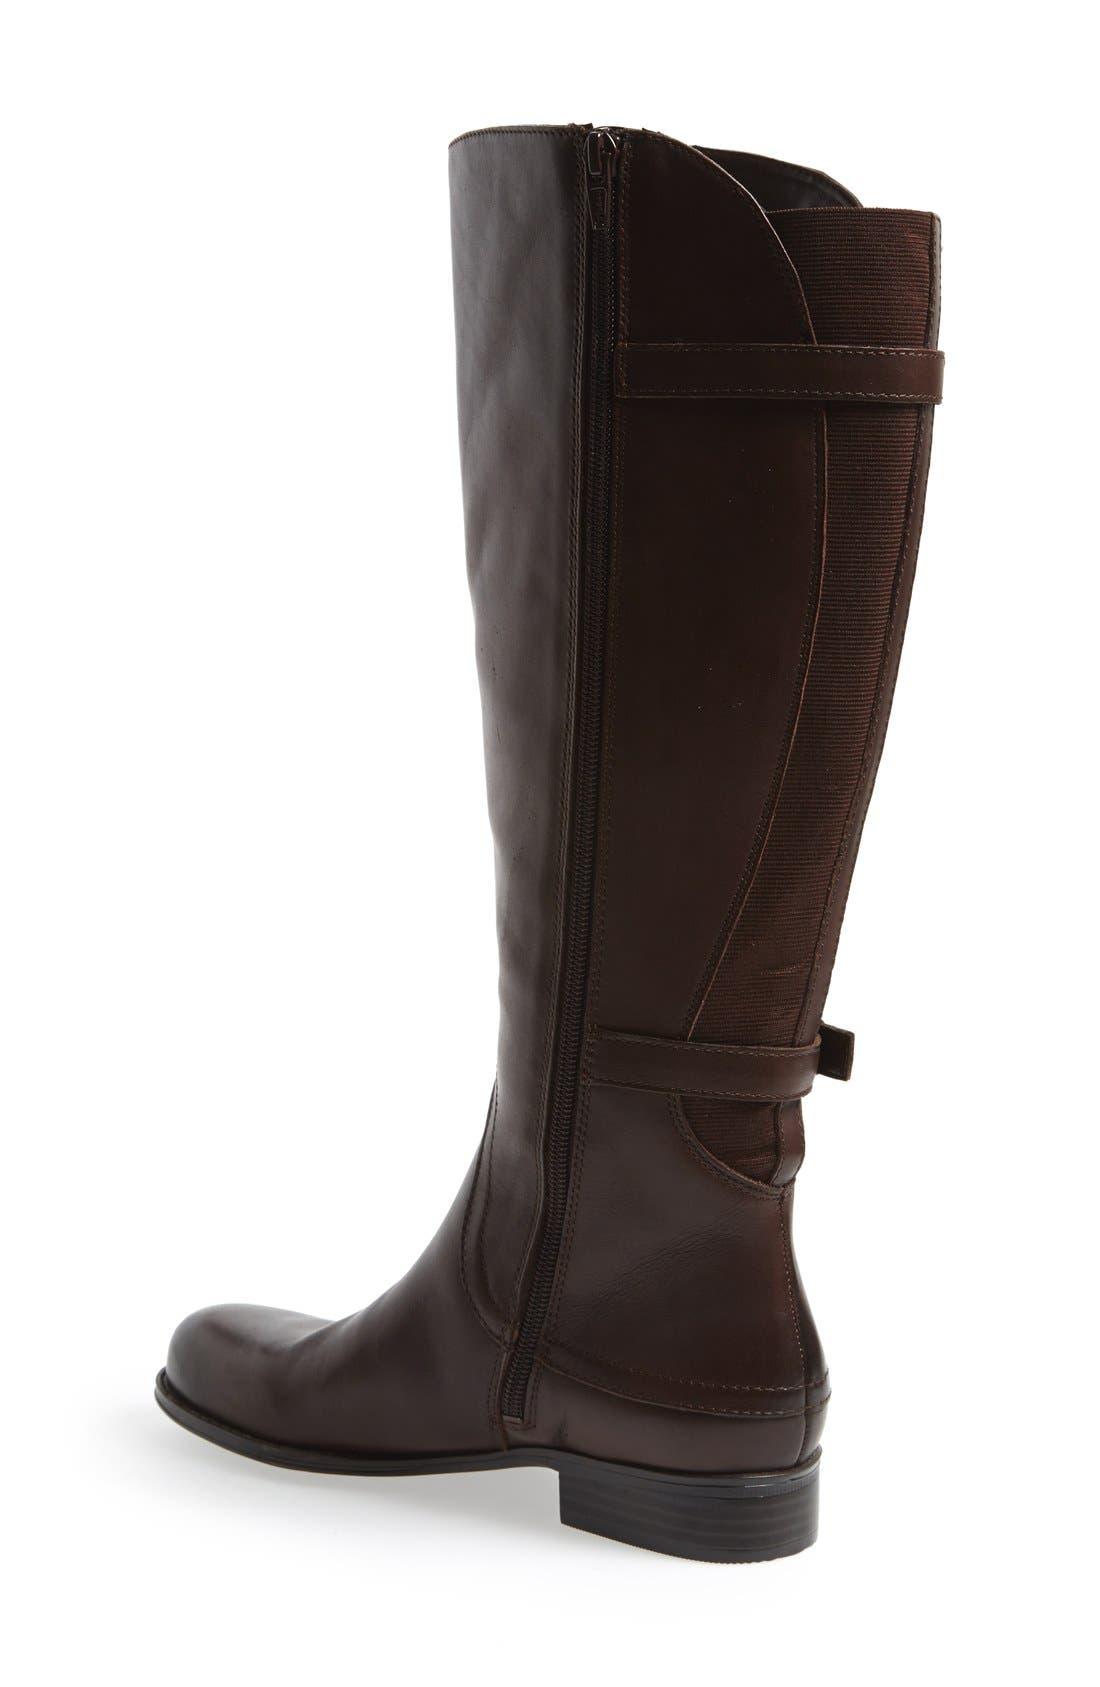 Alternate Image 2  - Naturalizer 'Jamison' Tall Boot (Wide Calf) (Women)